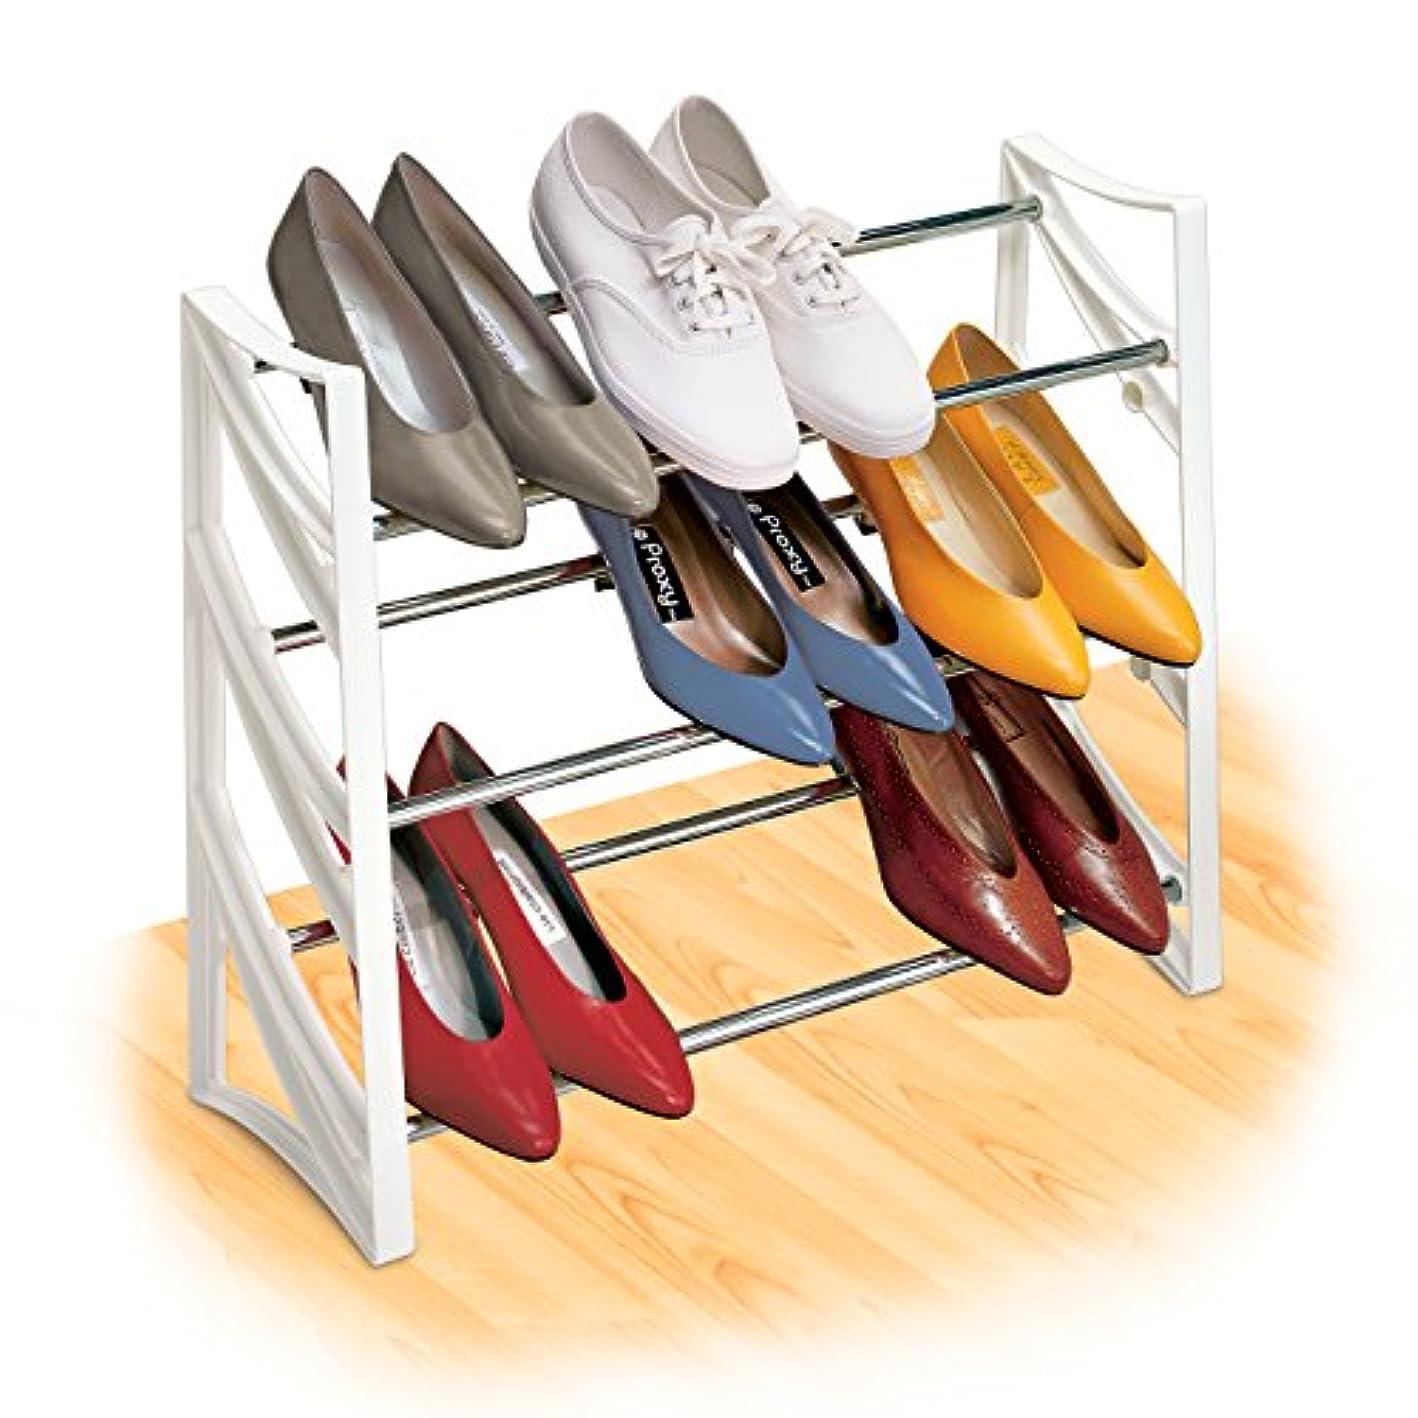 Lynk 9 Pair Convertible Shoe Rack Organizer - 3 Tier - Closet Shoe Rack - White rktmng6187874